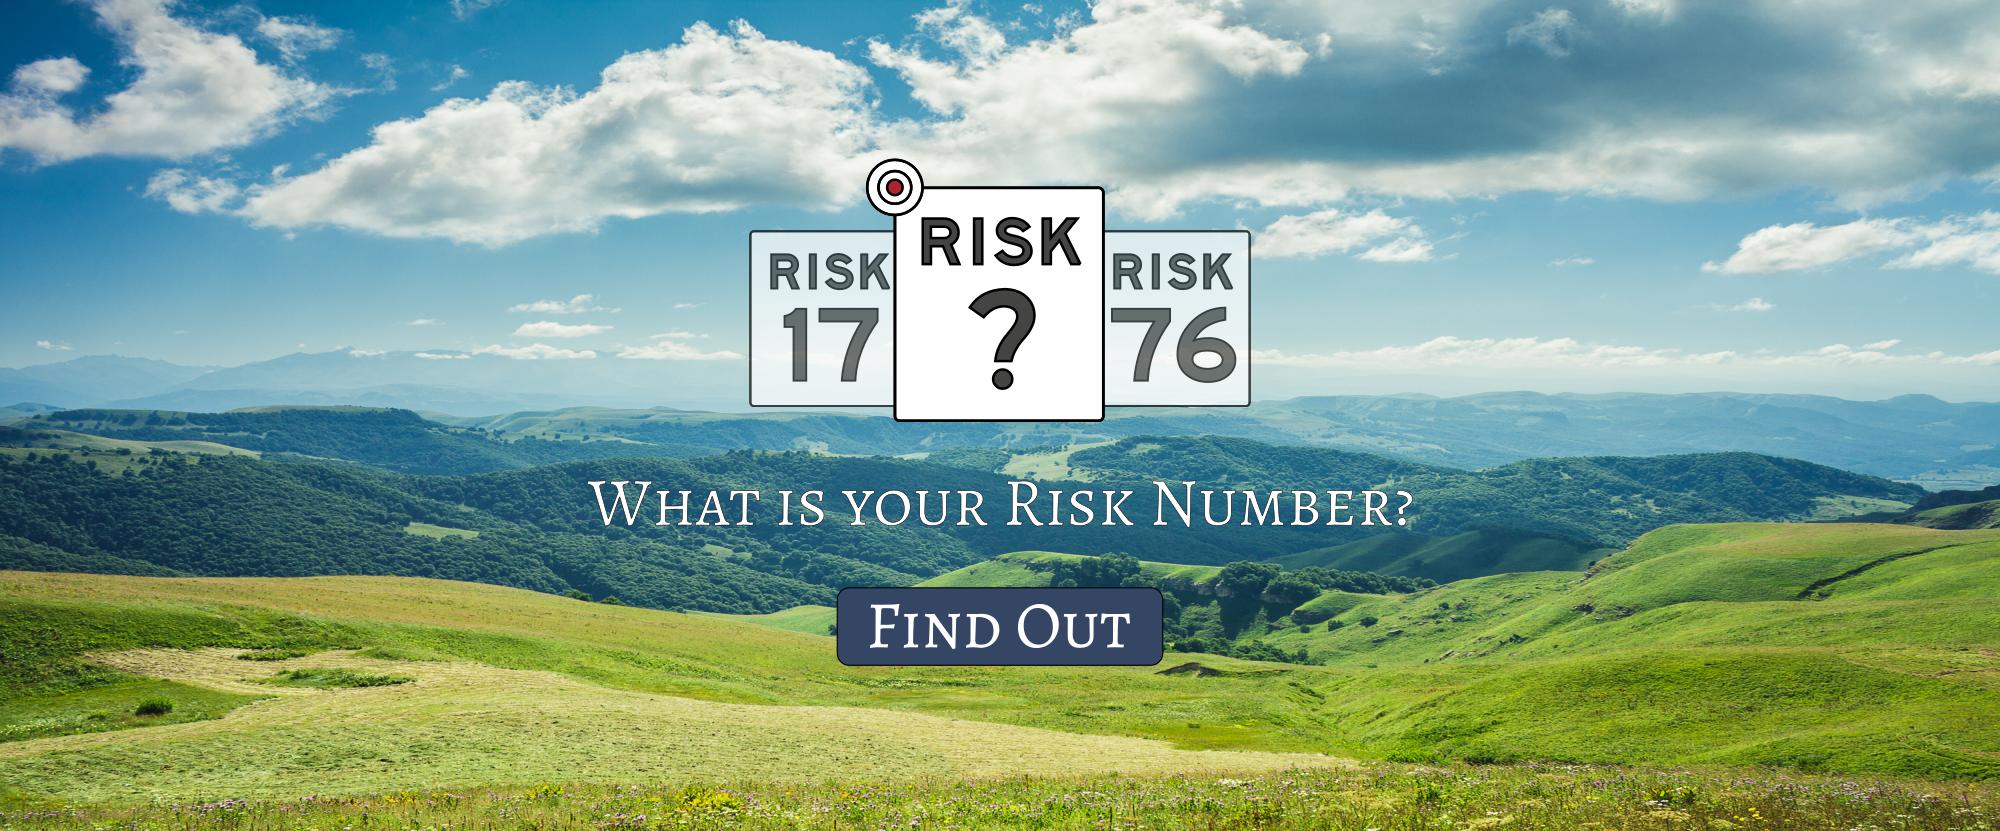 risk-number-slider-mountain3